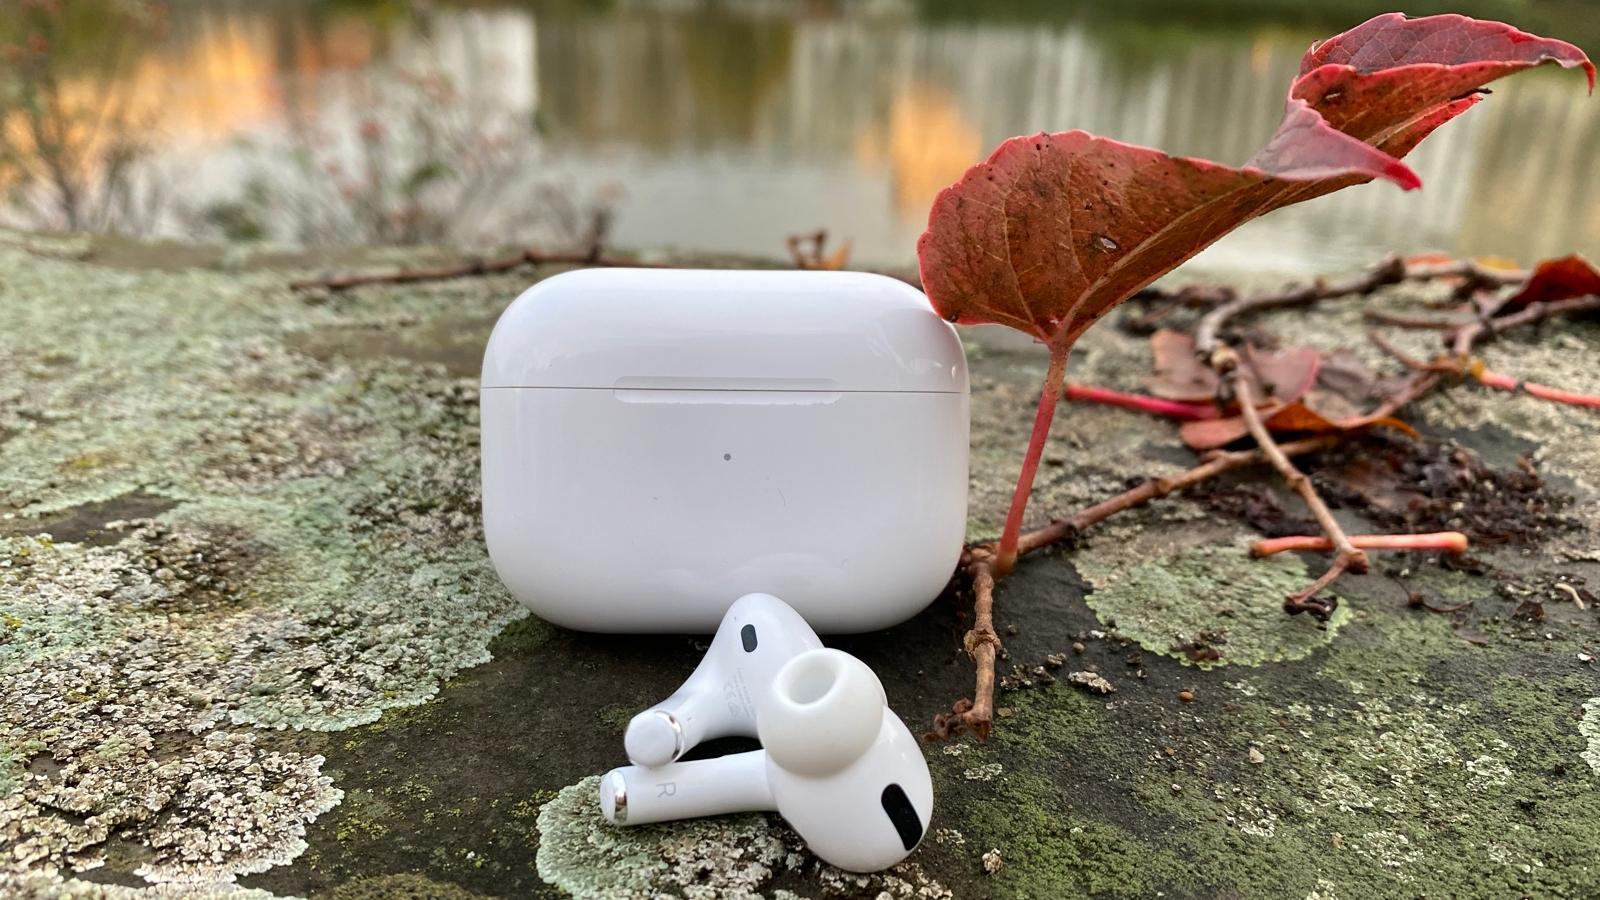 Review Apple AirPods Pro lede